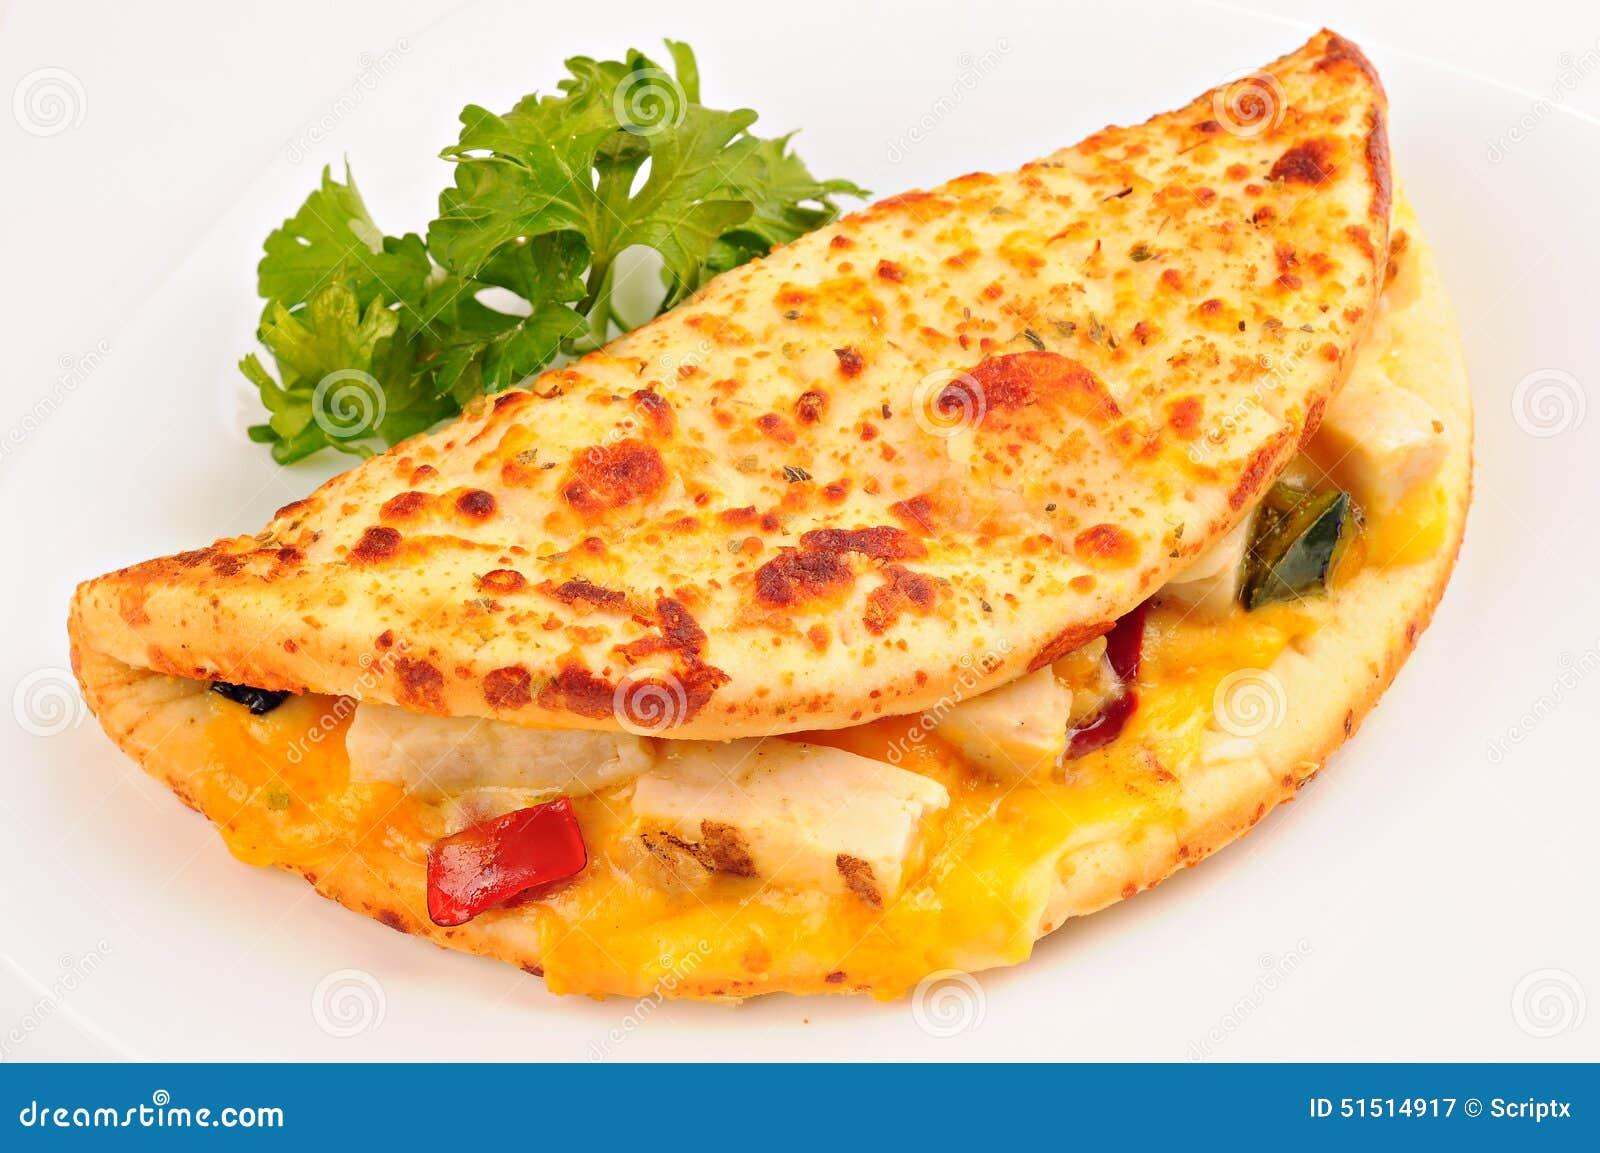 Background Cheese Chicken Grilled Parsley Pepper Sandwich